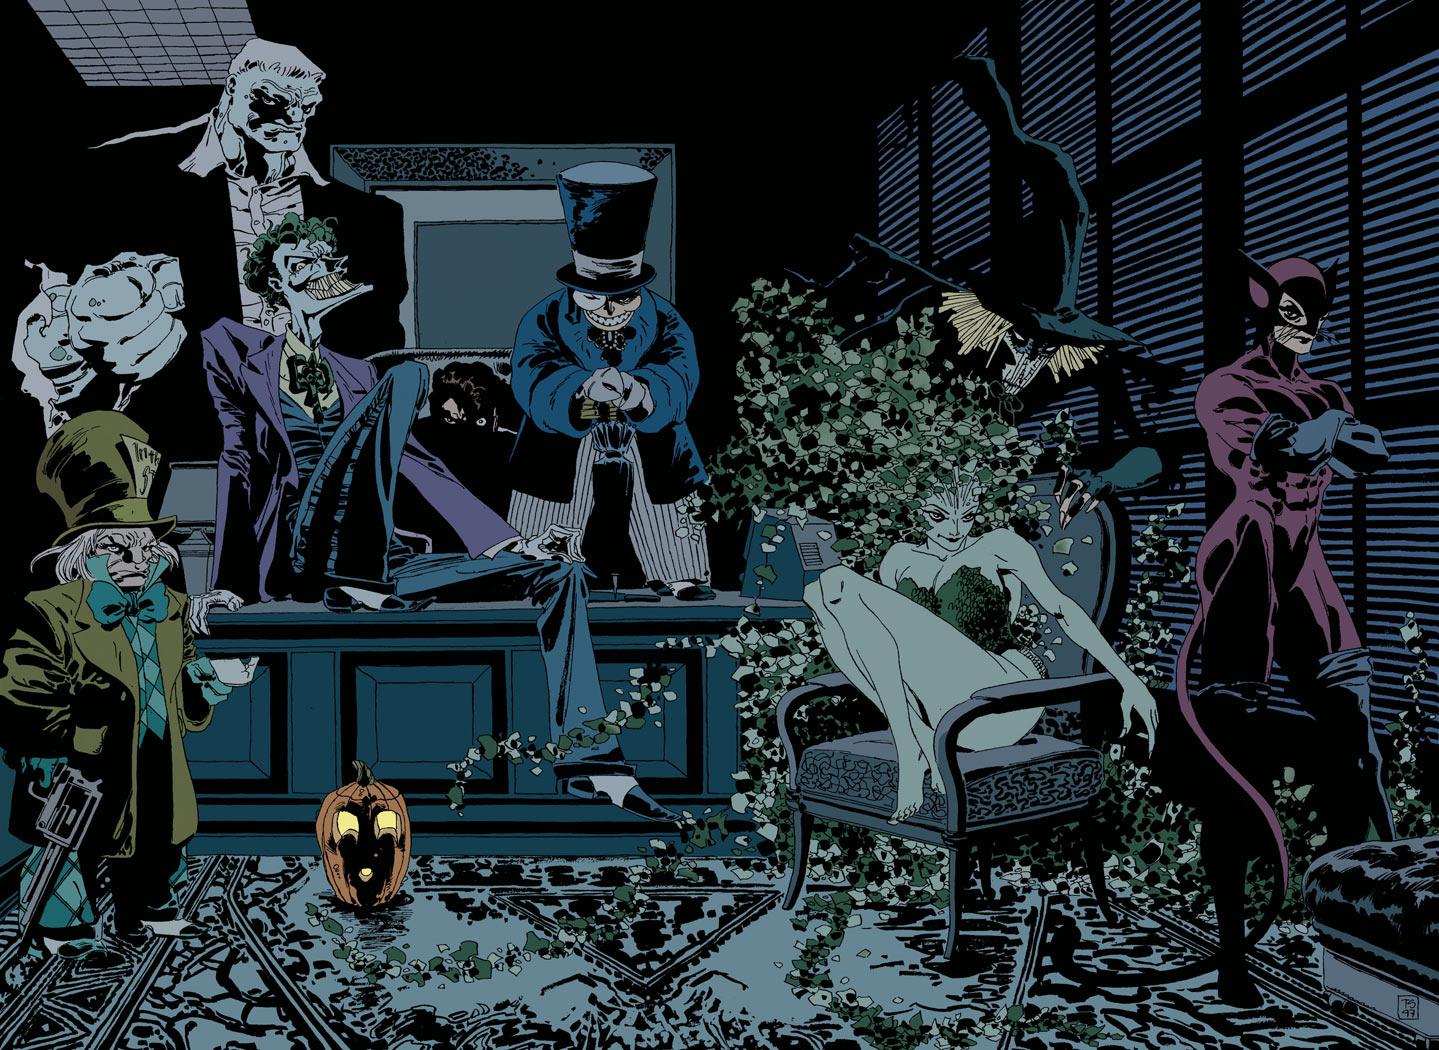 Comics Dune | Buy Comics Online: Batman – The Long Halloween | Comics